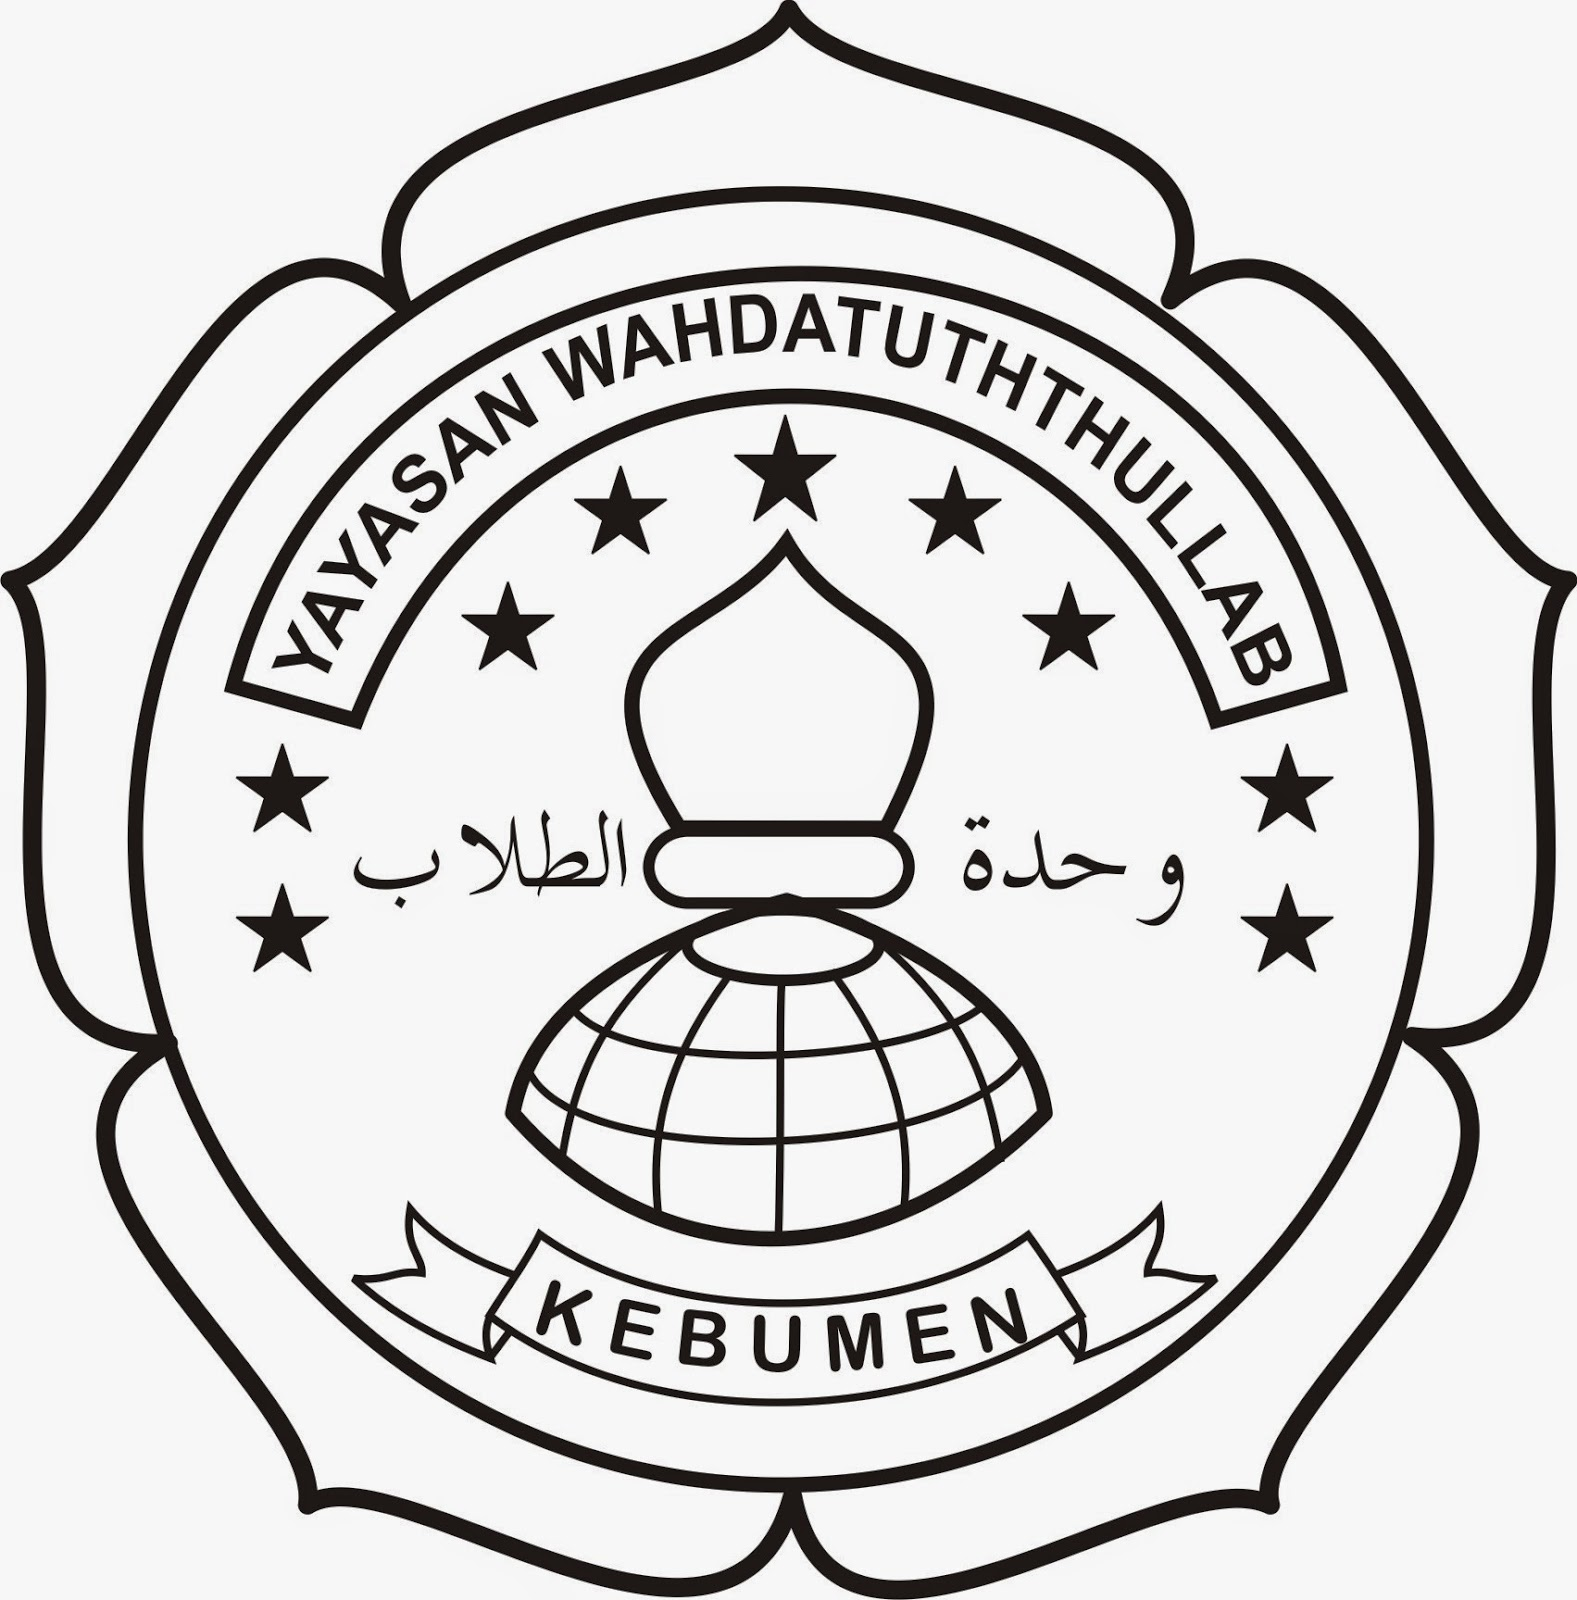 Logo MA Pondokgebangsari Kuwarasan (MA Wahdatuththullab